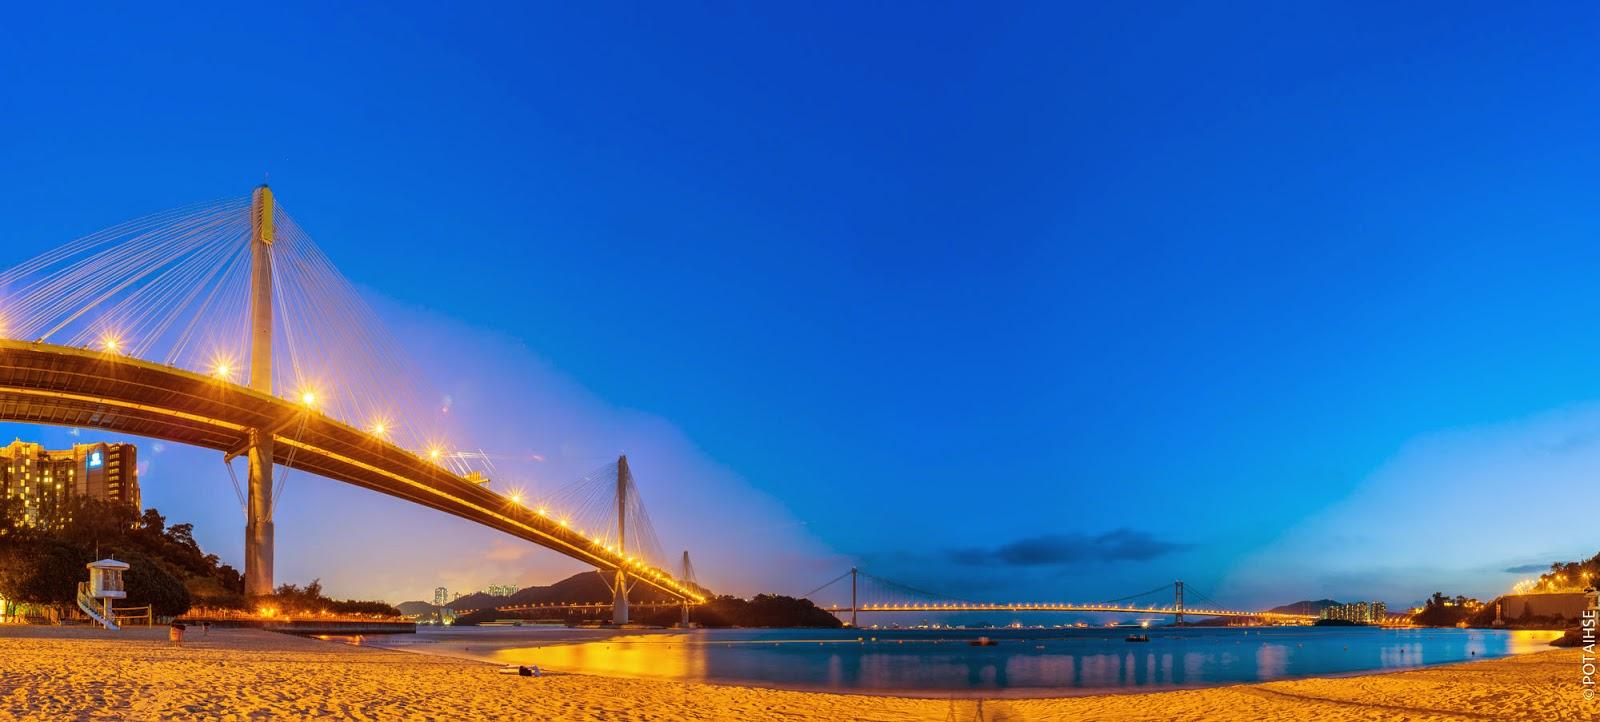 Potaihse Gallery: 麗都灣 / Lido Beach